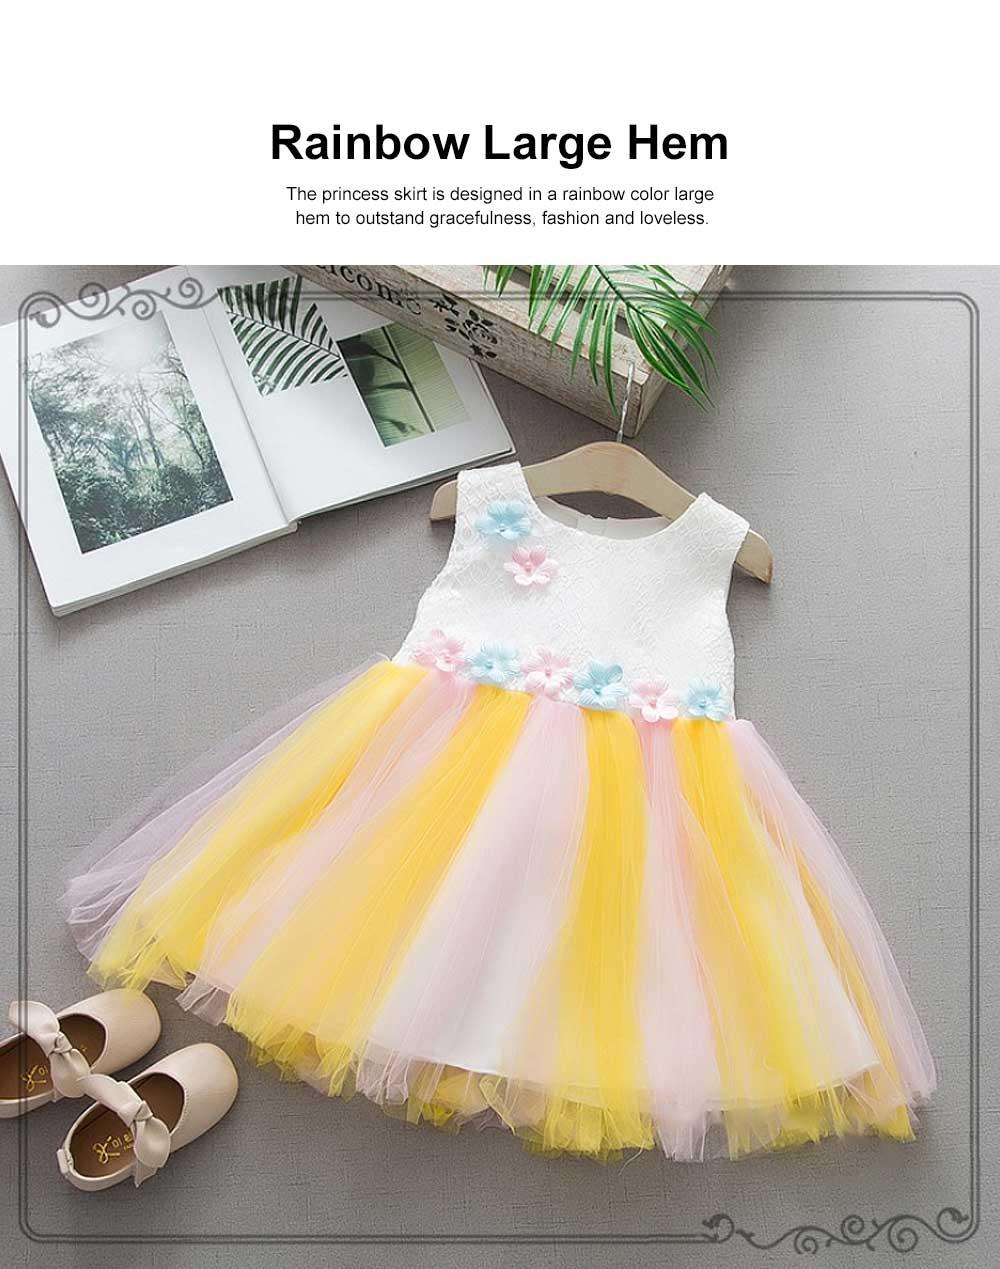 Rainbow Color Princess Skirt for Girl Kids, Summer Wear Korean Style Sleeveless One-piece Dress Princess Skirt for 1-3 Years 2